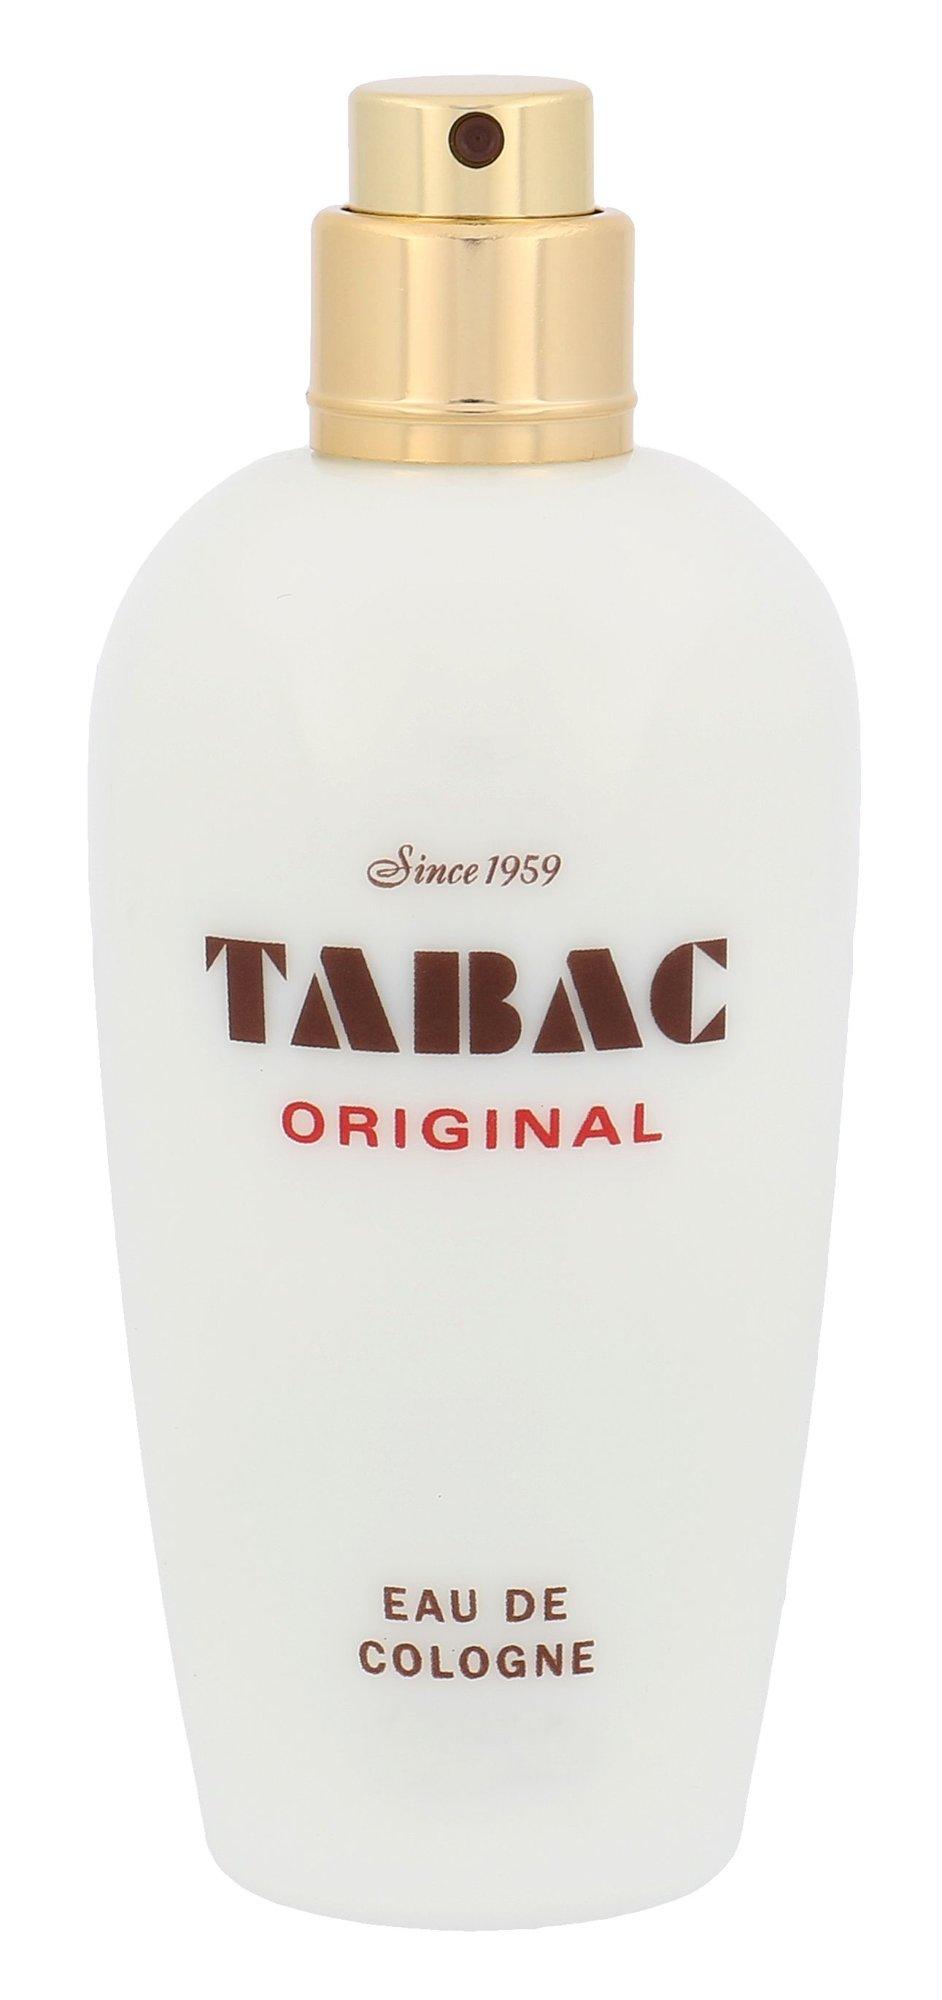 Tabac Original Cologne 50ml